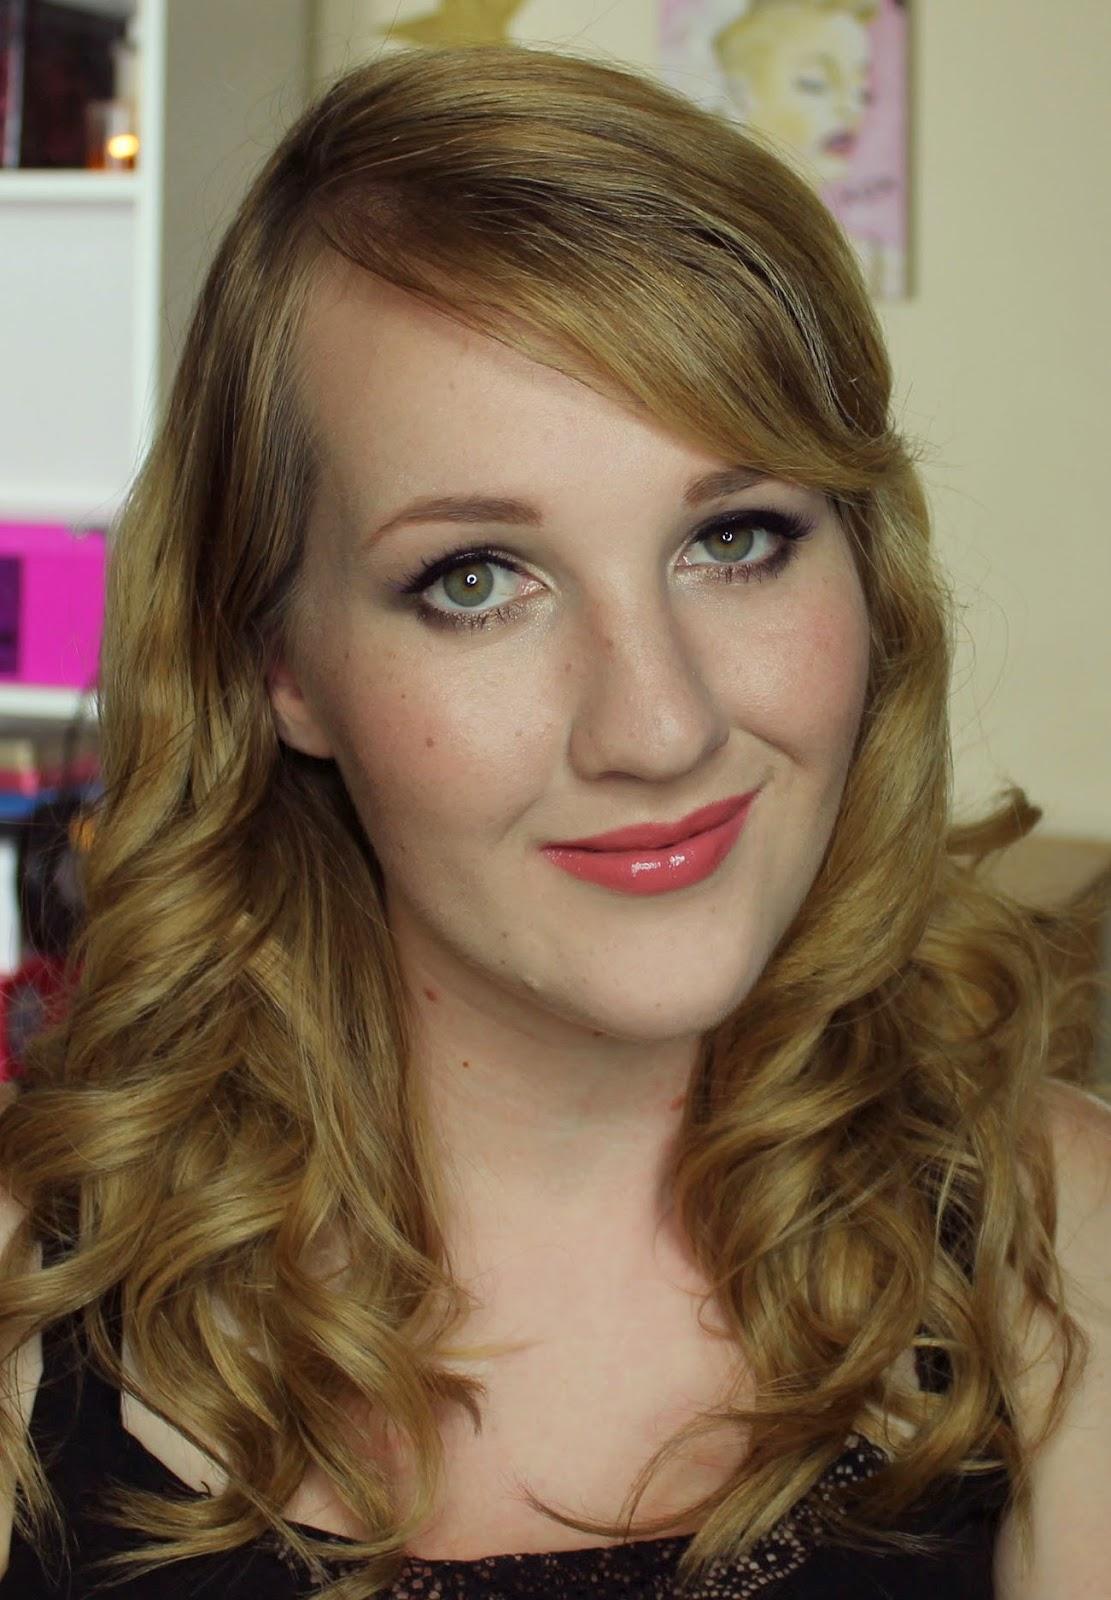 ZA Vibrant Moist Lipstick - RS342s swatches & review